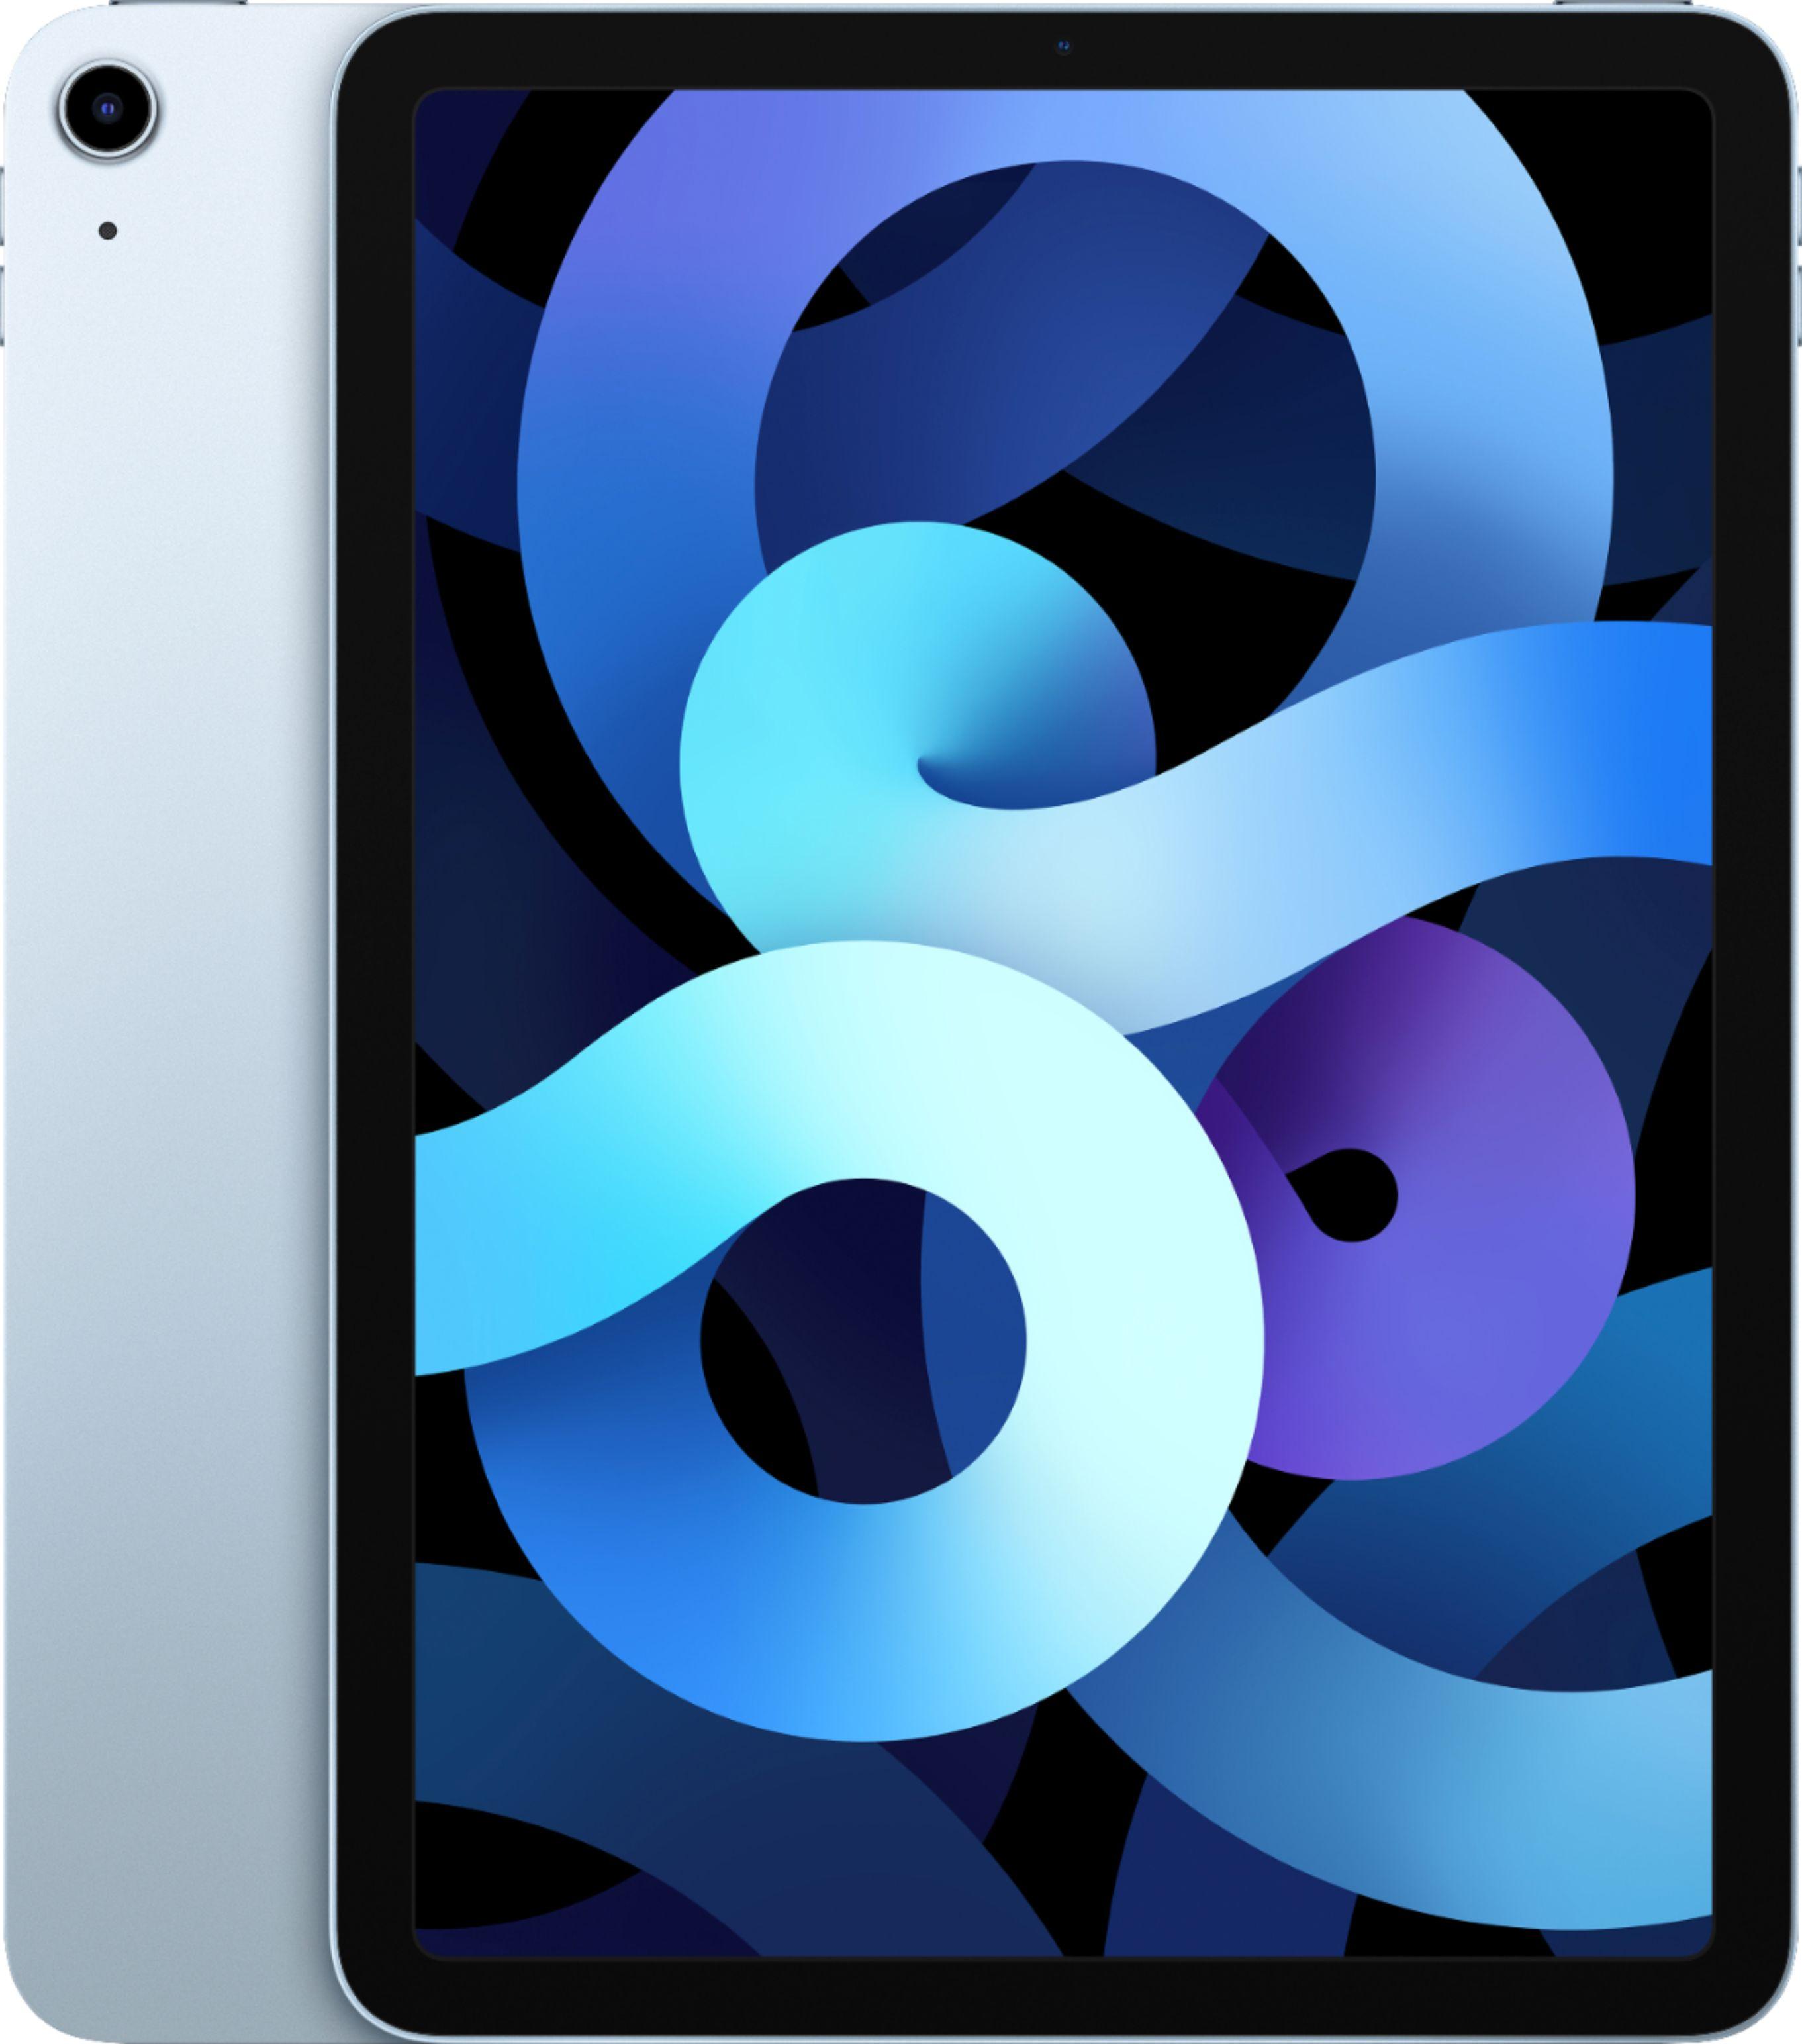 Refurbished Apple iPad Air 4 64GB Sky Blue Wi-Fi MYFQ2LL/A (Latest Model) $399